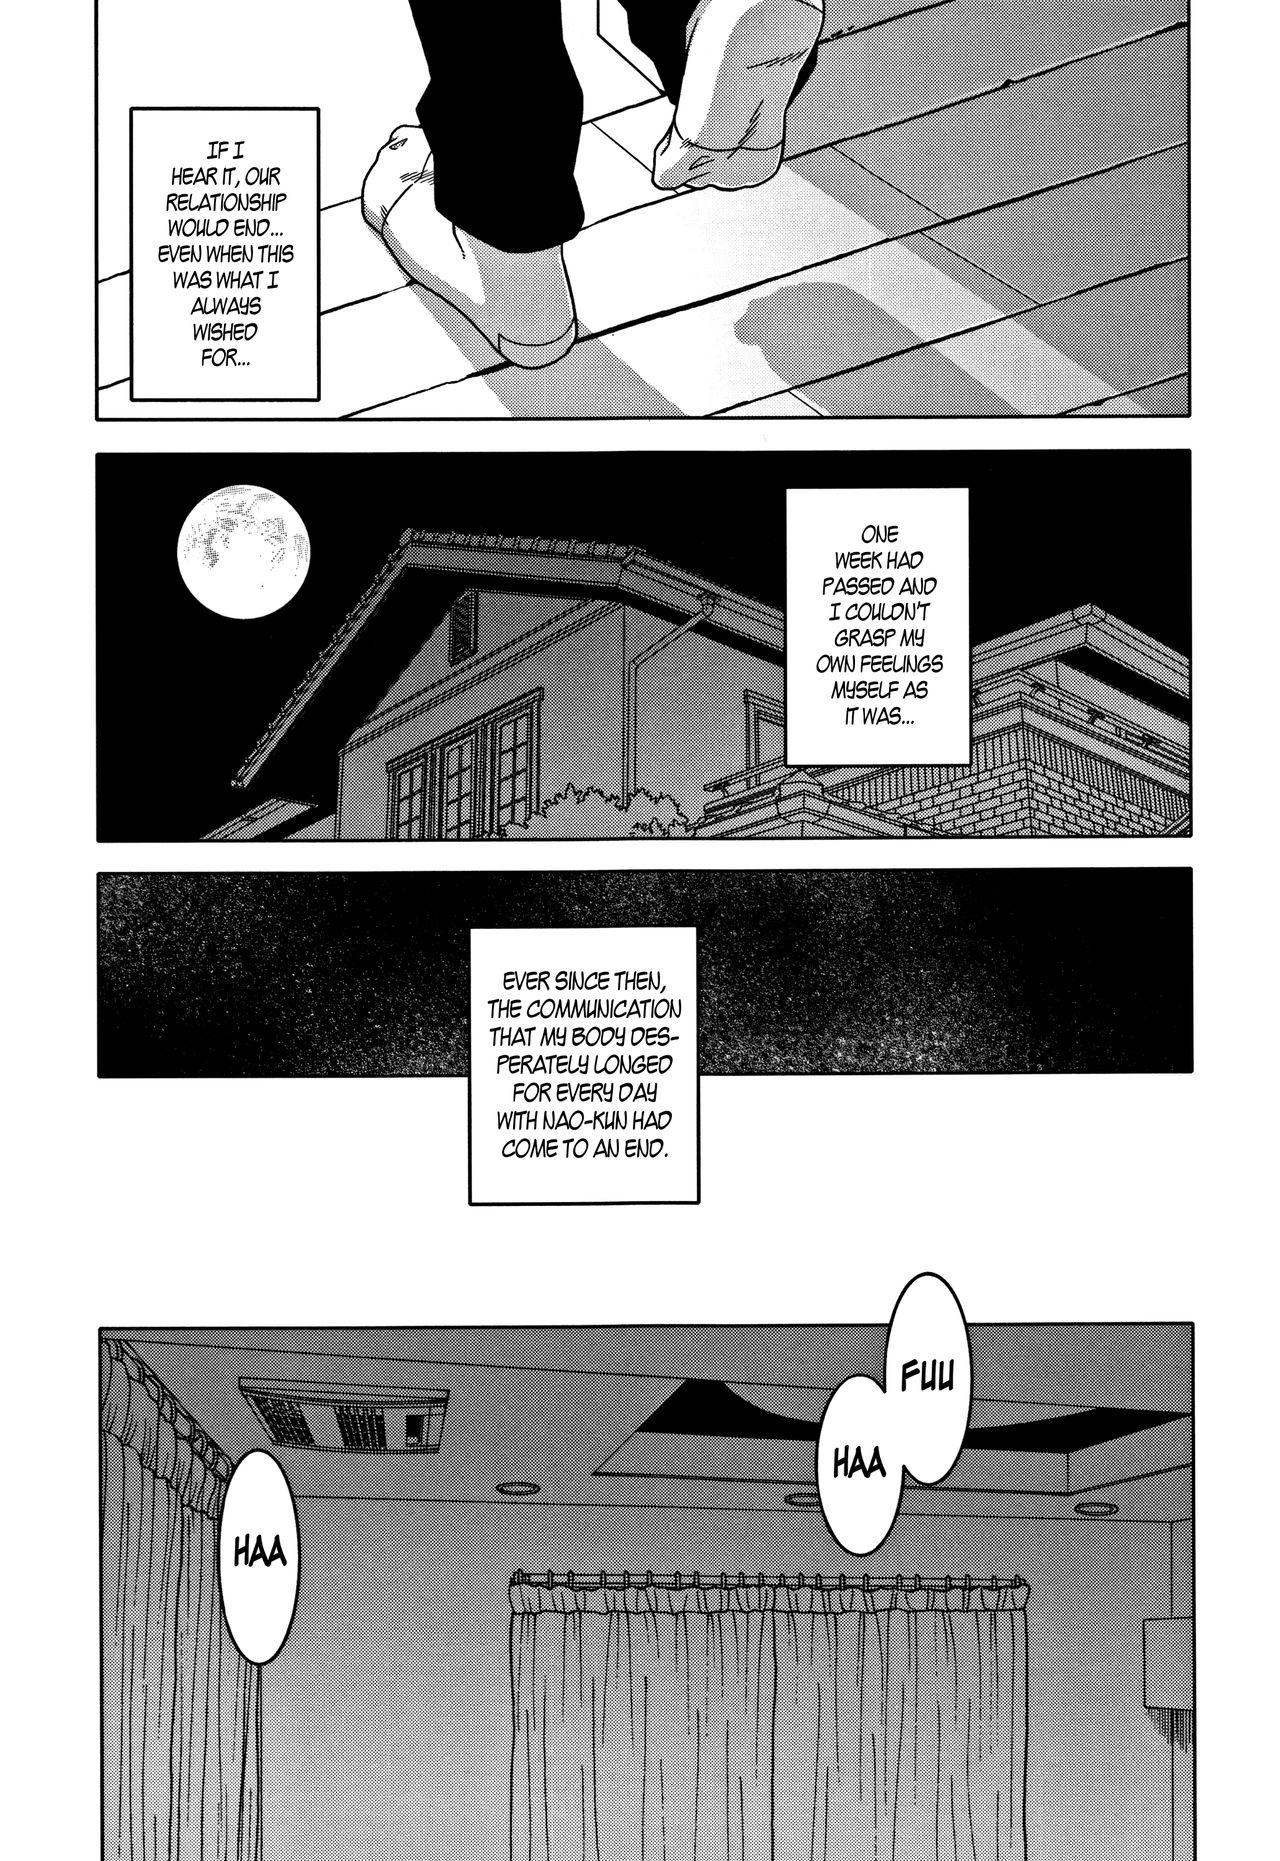 [Takatsu] Hitozuma A-san to Musuko no Yuujin N-kun - Married wife A and son's friend N-kun Ch. 1-3 [English] 78